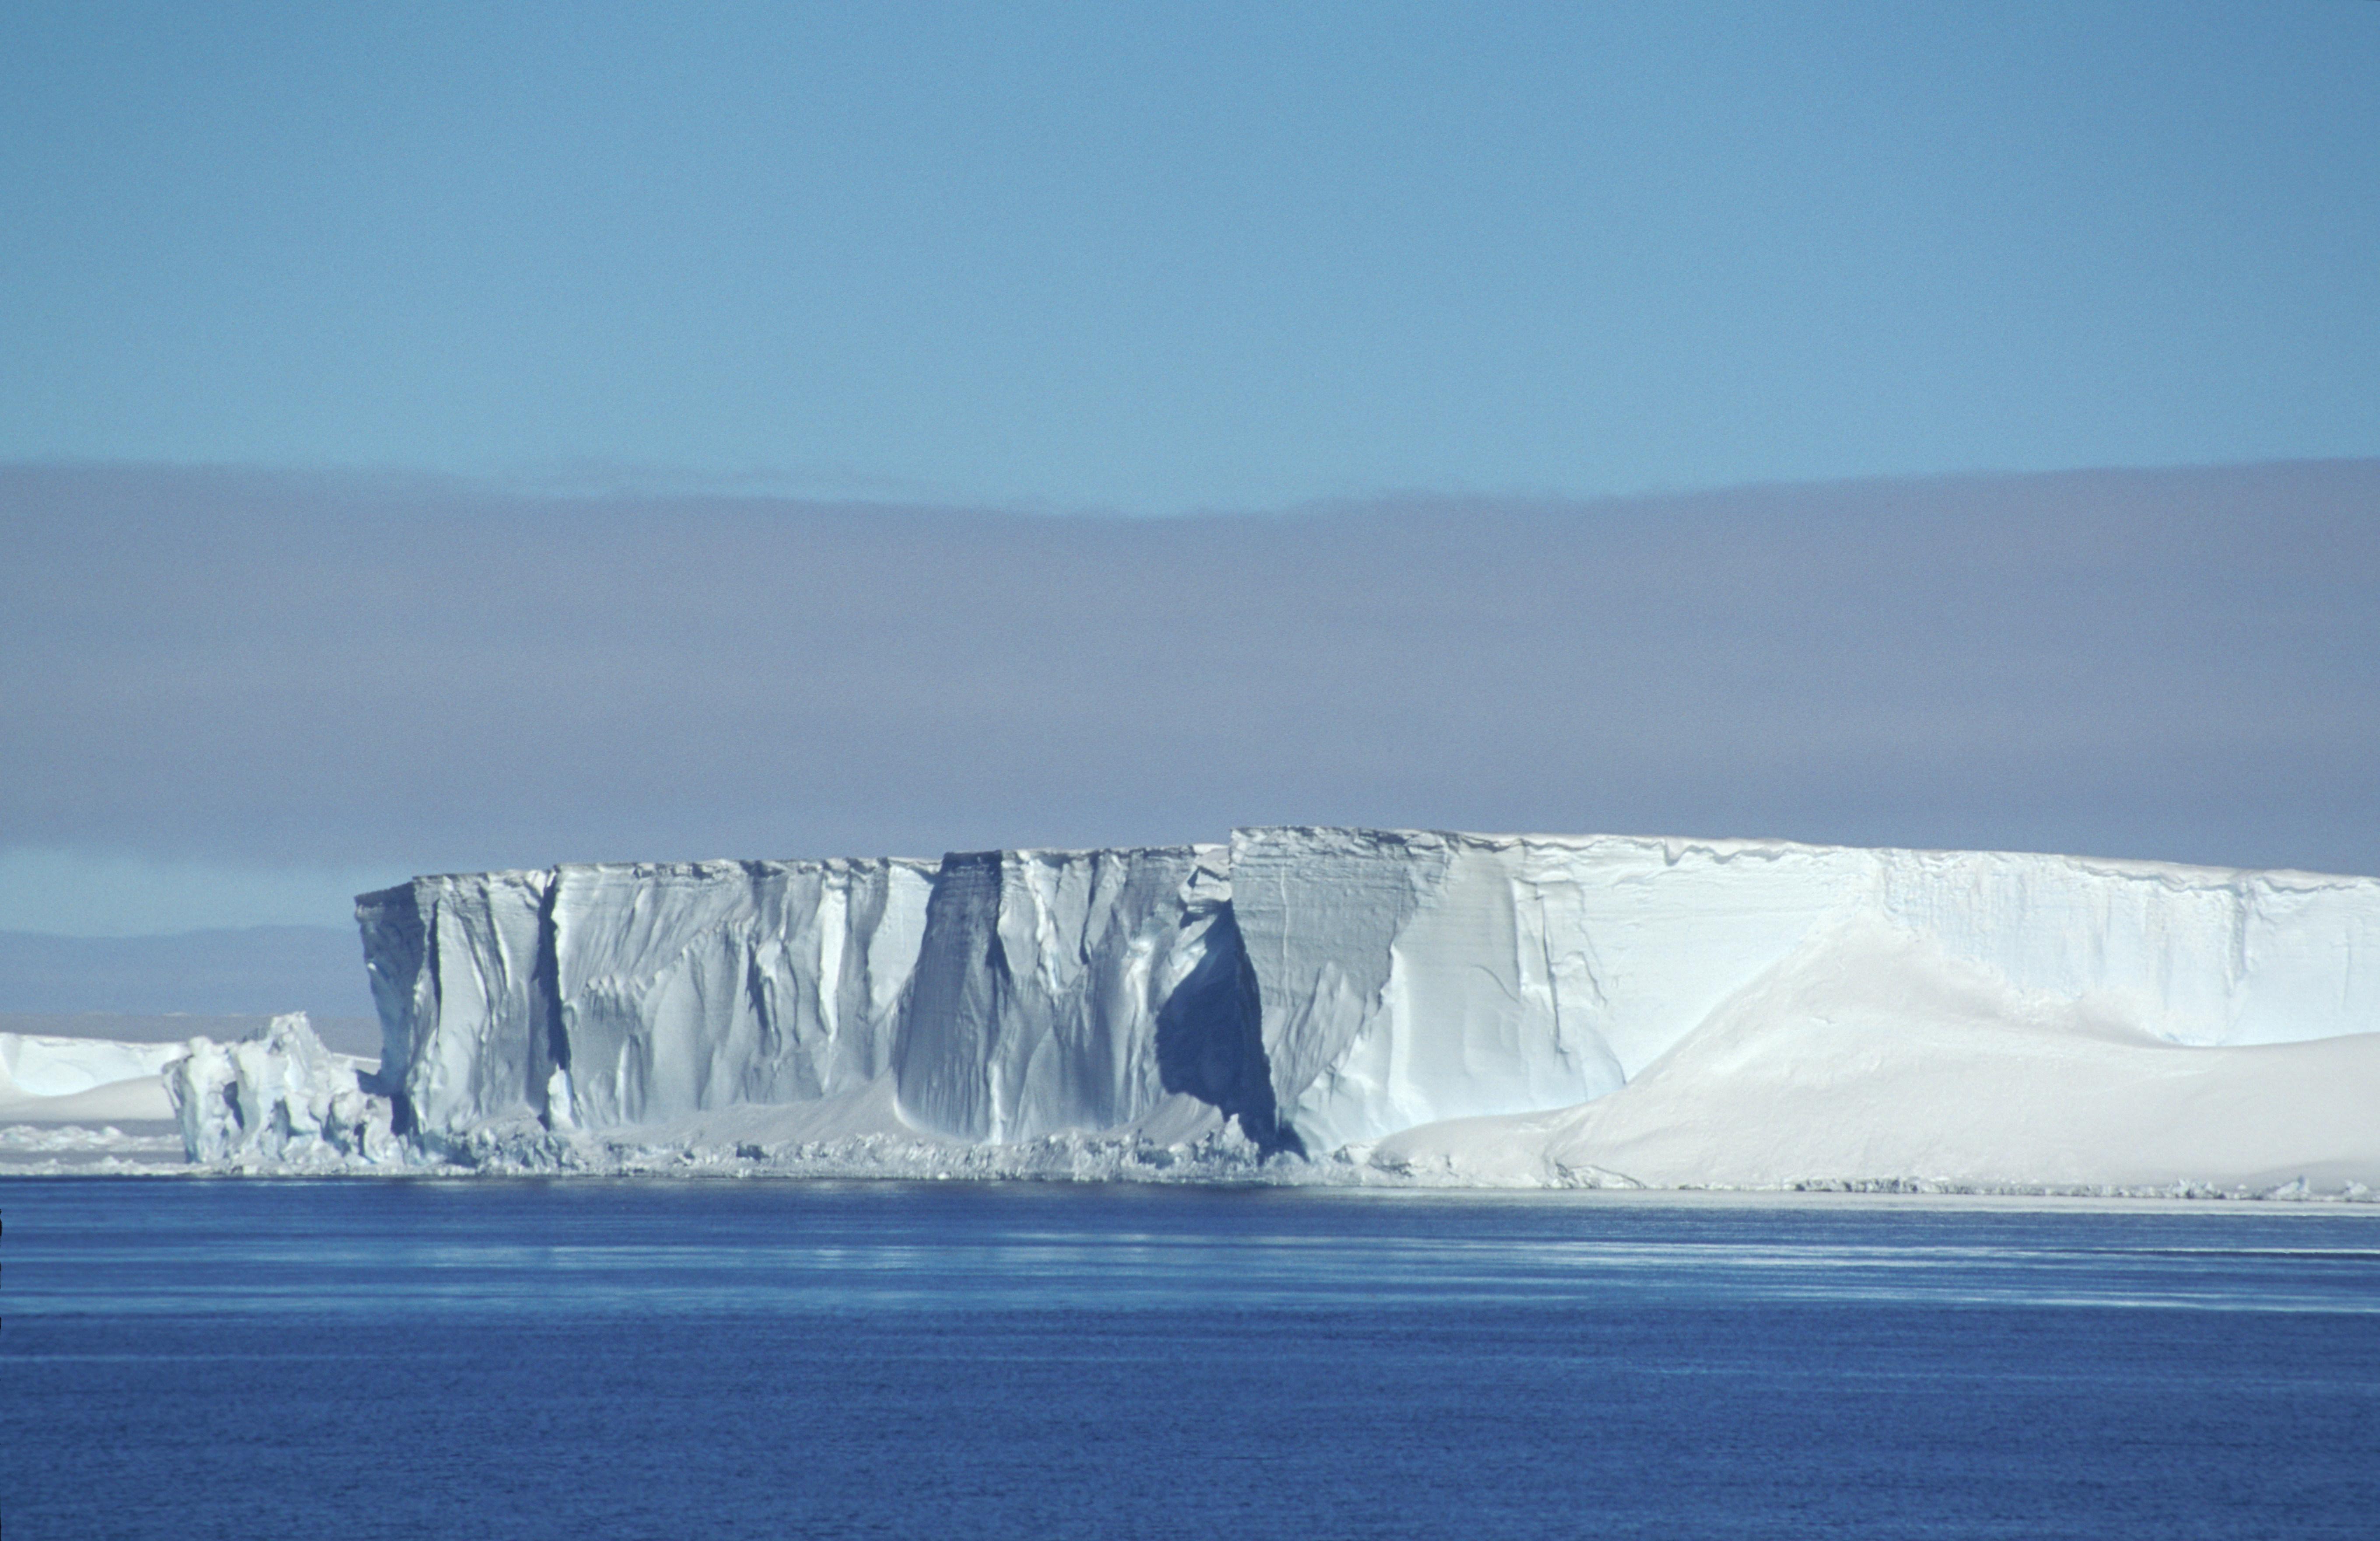 Ice headlands of Brunt Ice Shelf.